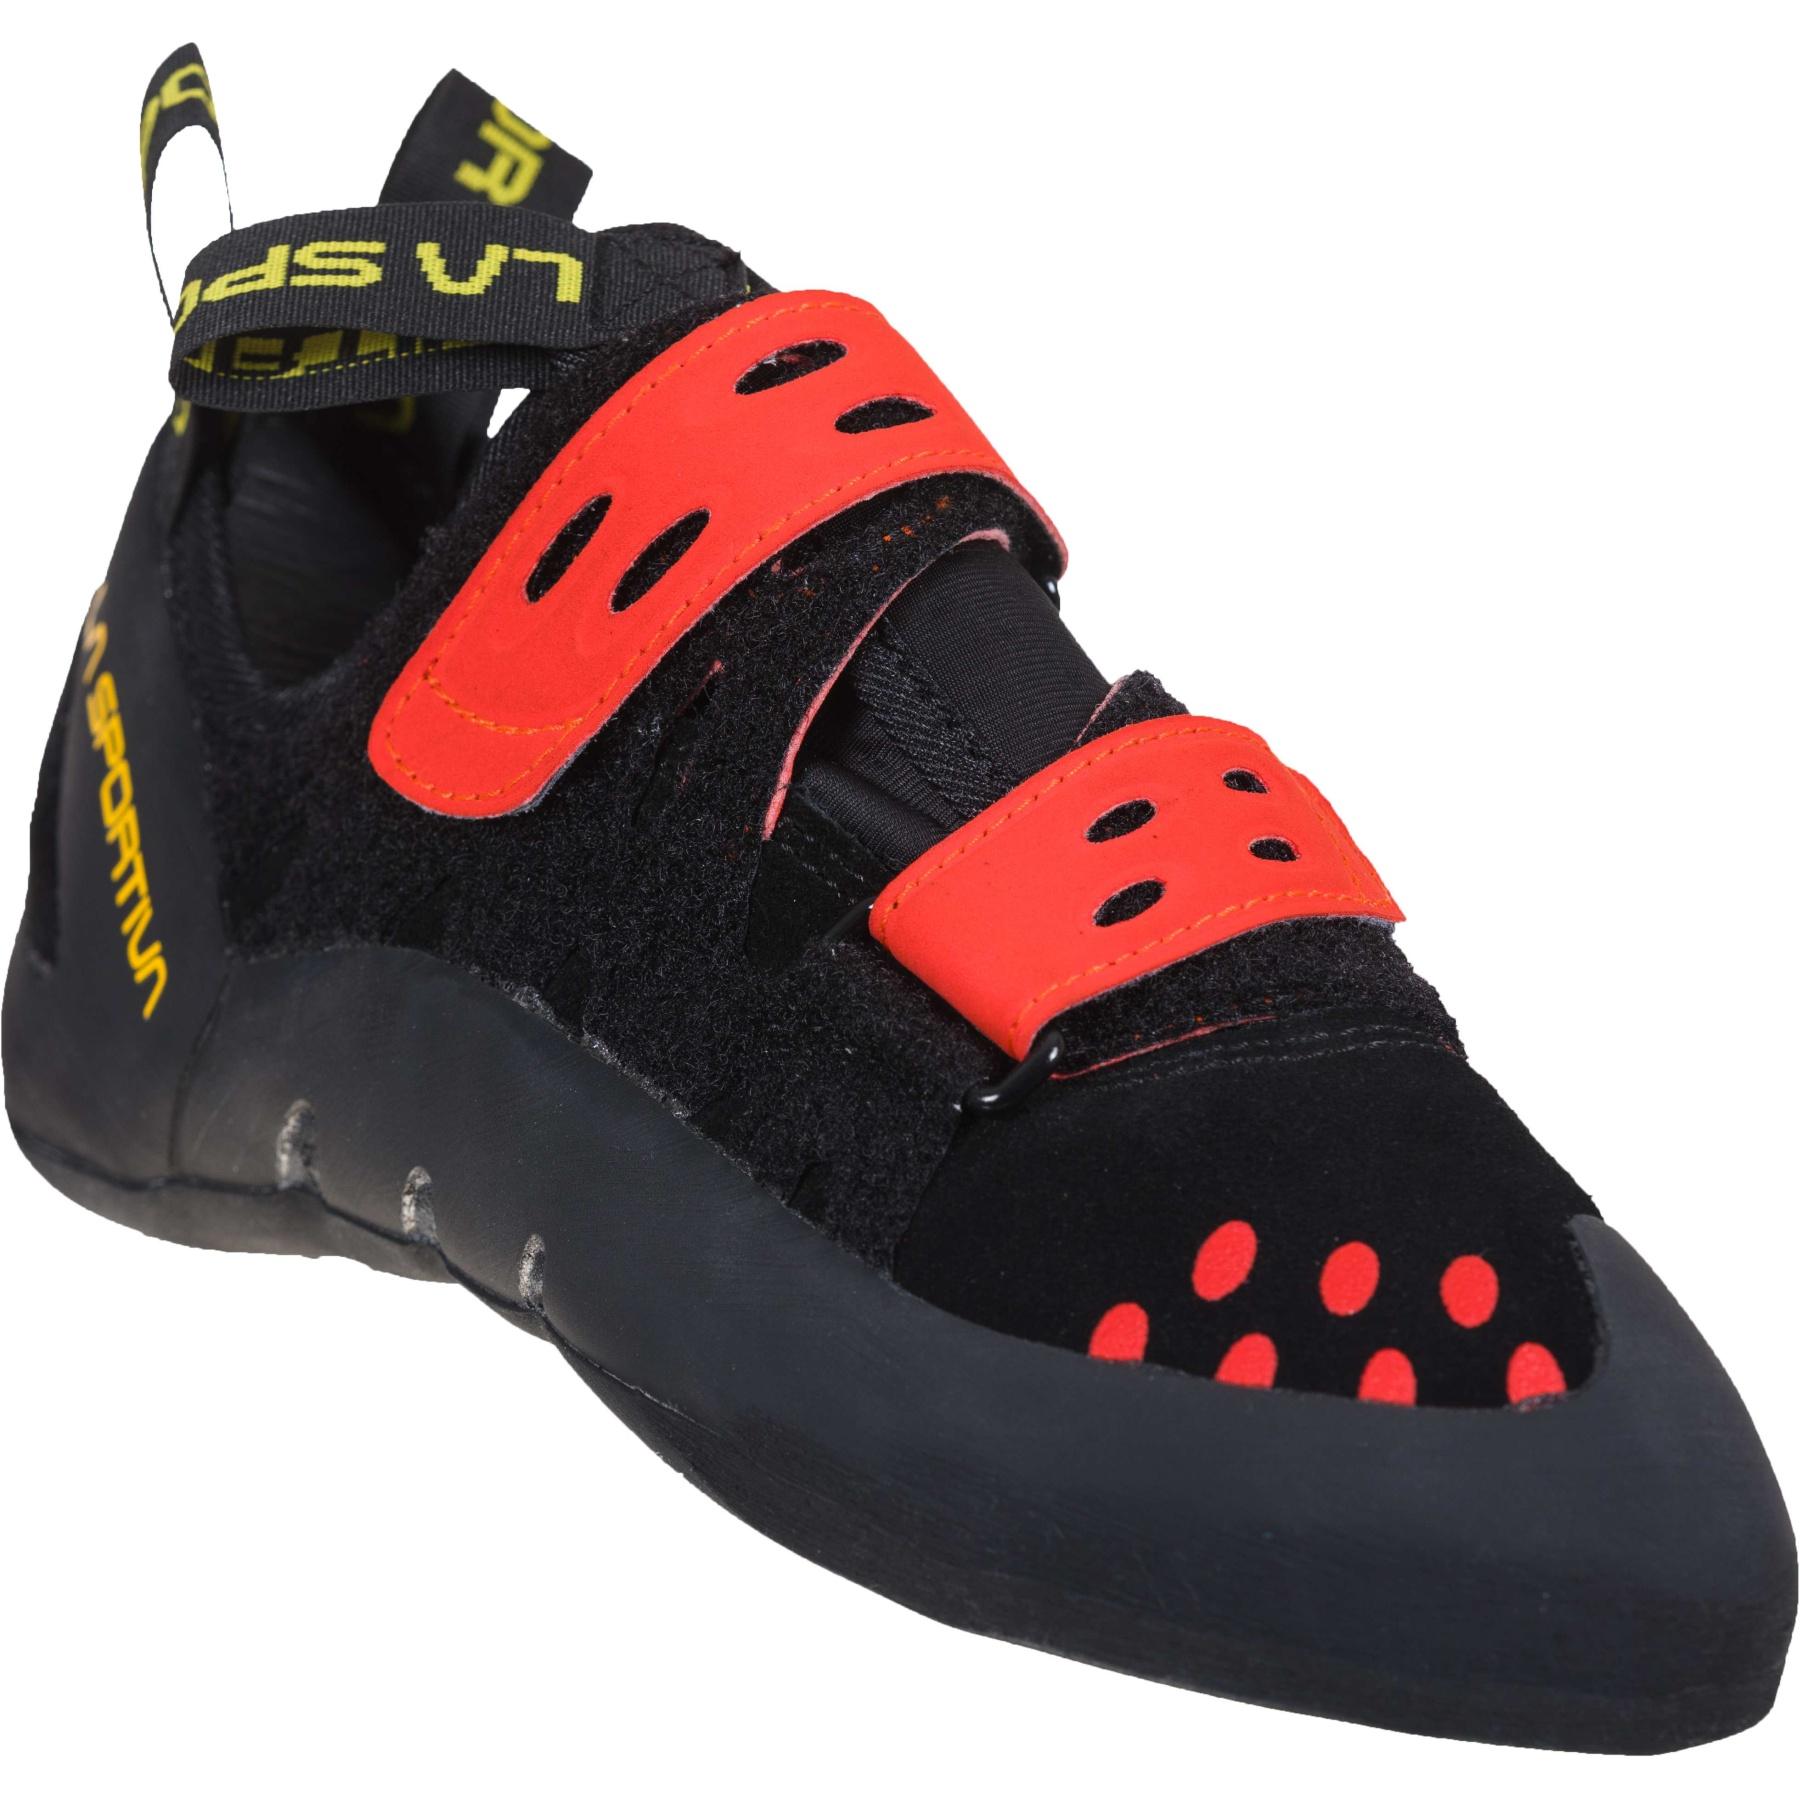 Image of La Sportiva Tarantula Climbing Shoes - Black/Poppy